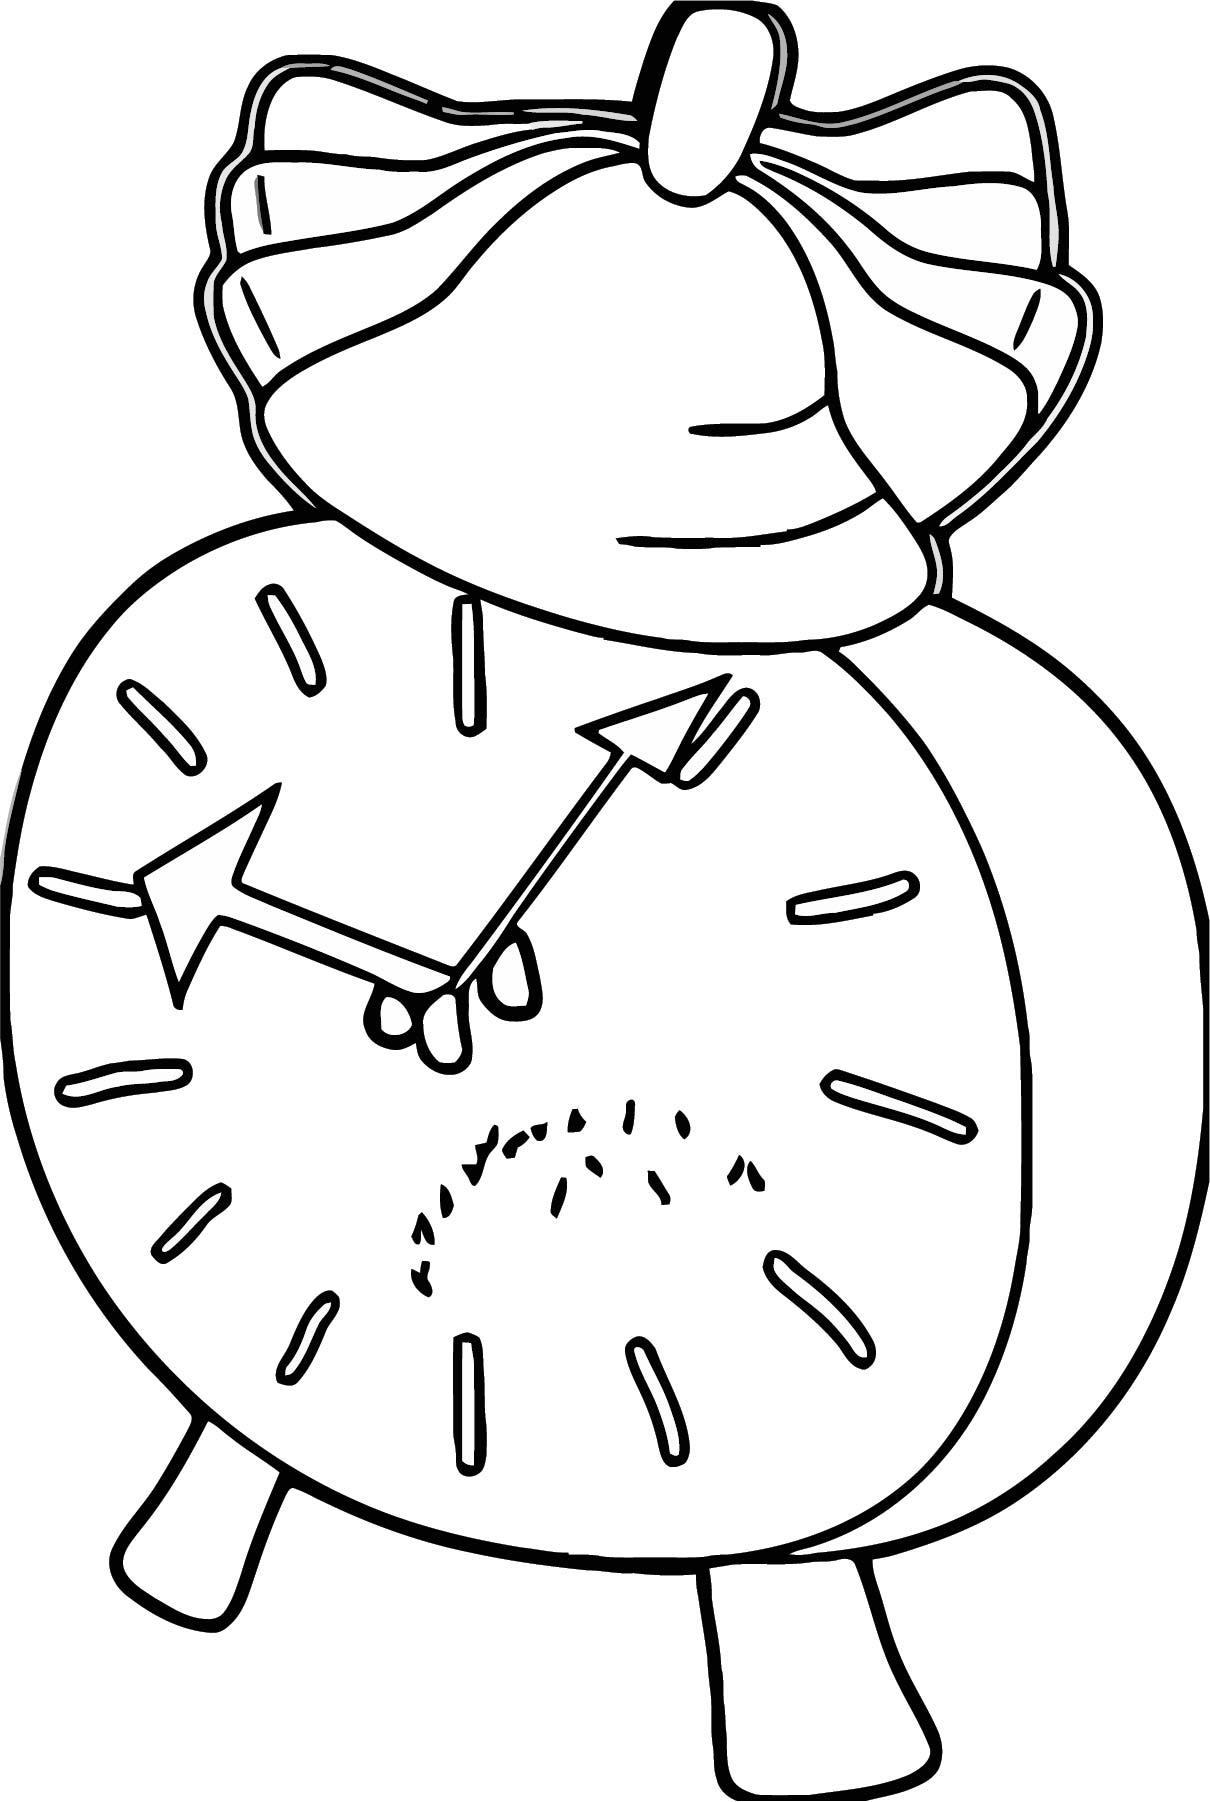 9irzkxk free printable ie cartoonized free printable coloring page